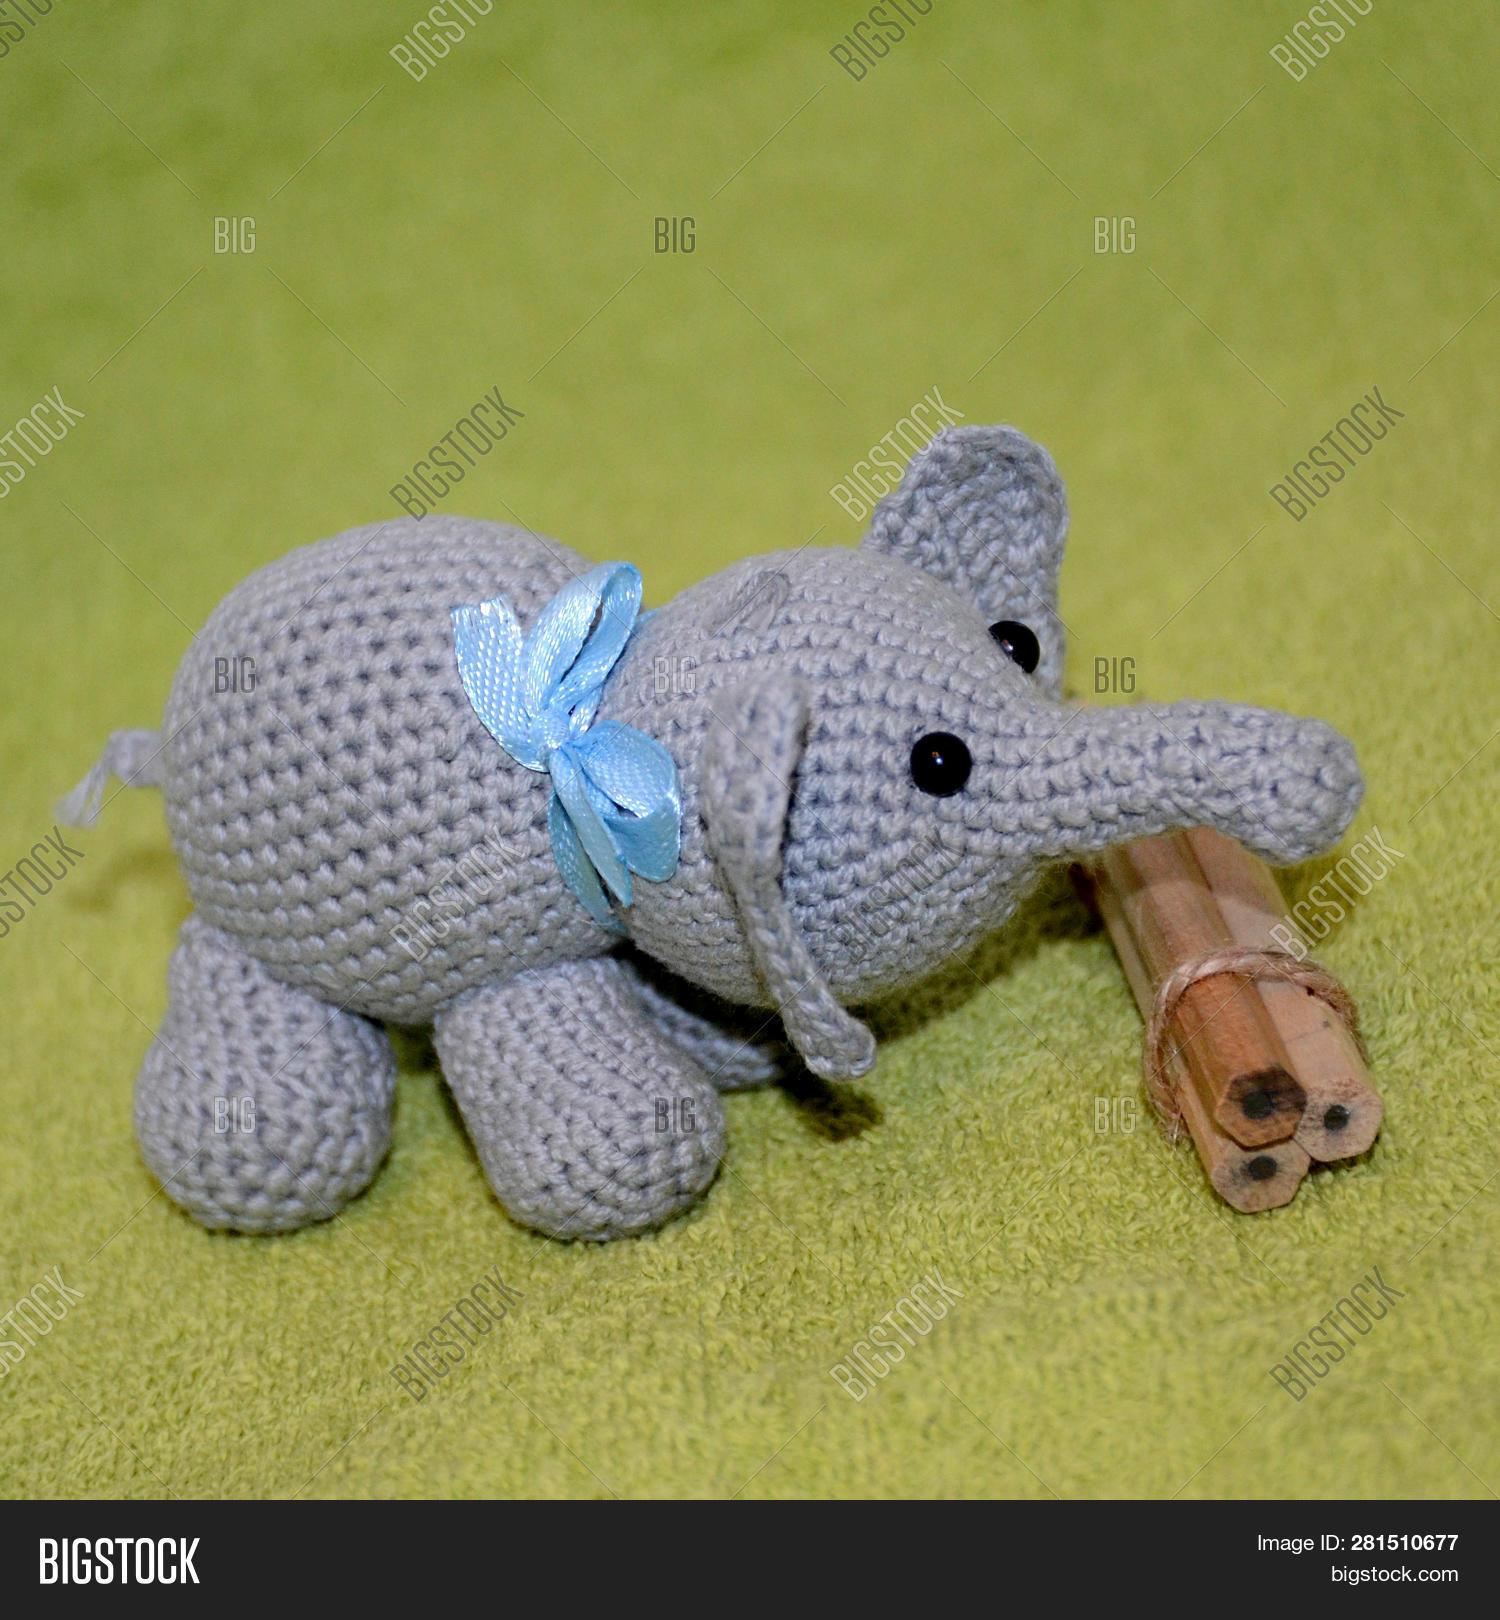 Crochet Amigurumi Elephant   1620x1500